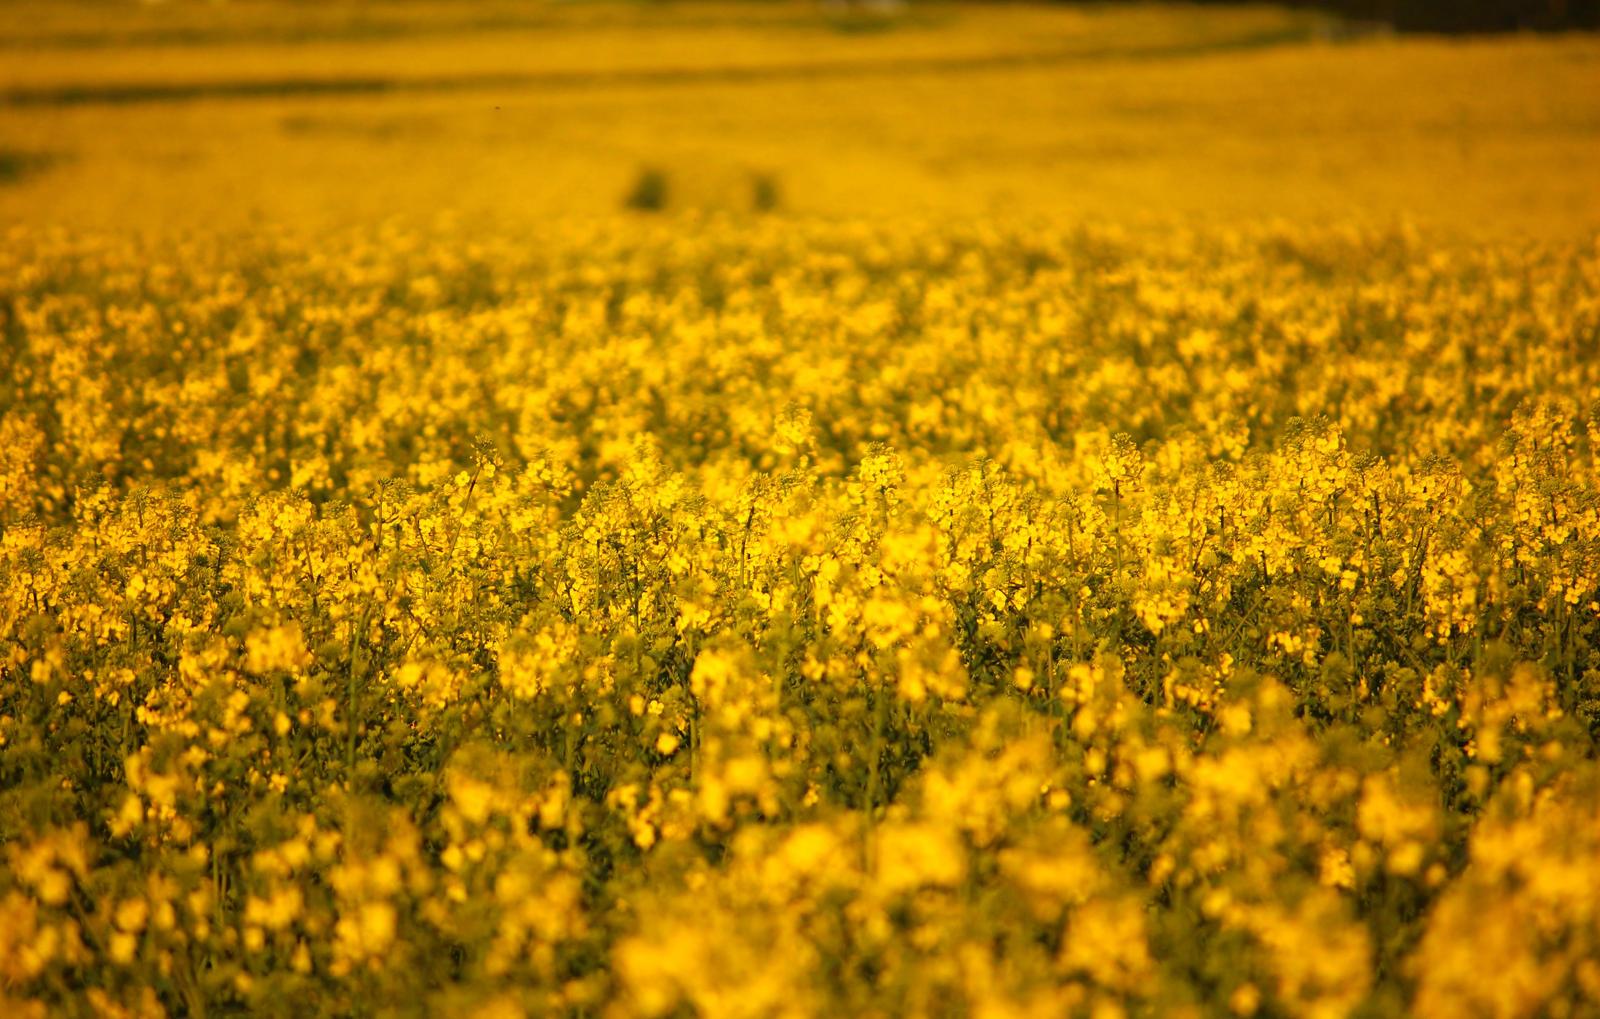 field of rape in spring by LoveForDetails